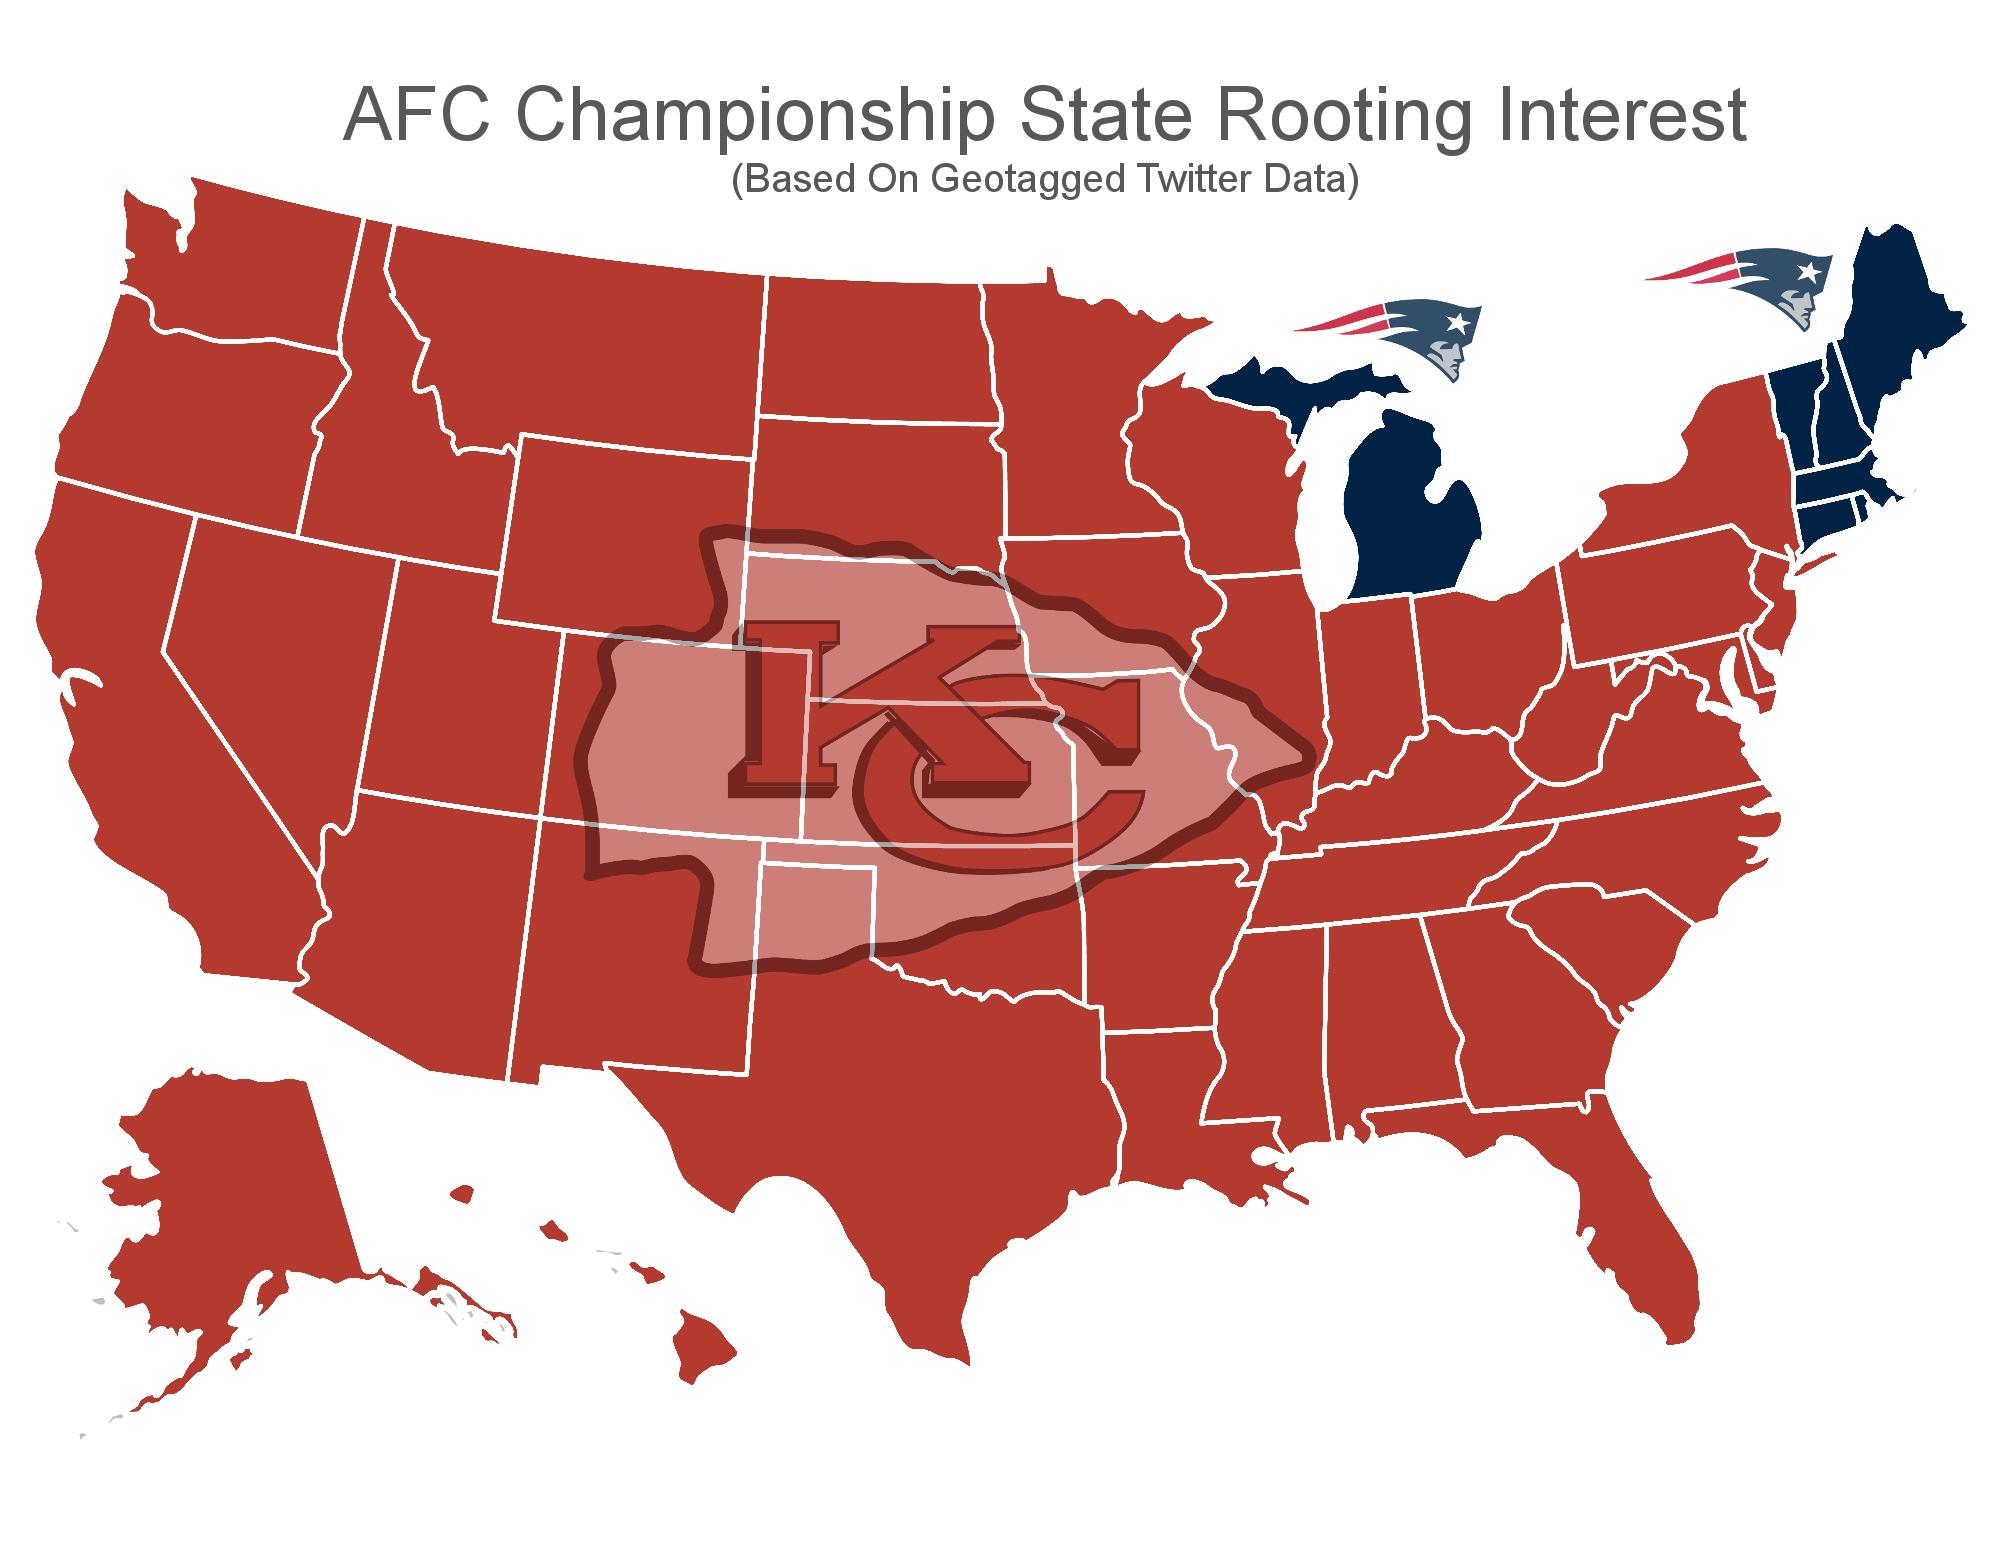 Pats Rams Map Rams Vs Pats Map Patriots Vs Rams Fan Map within Super Bowl Fan Map 2019